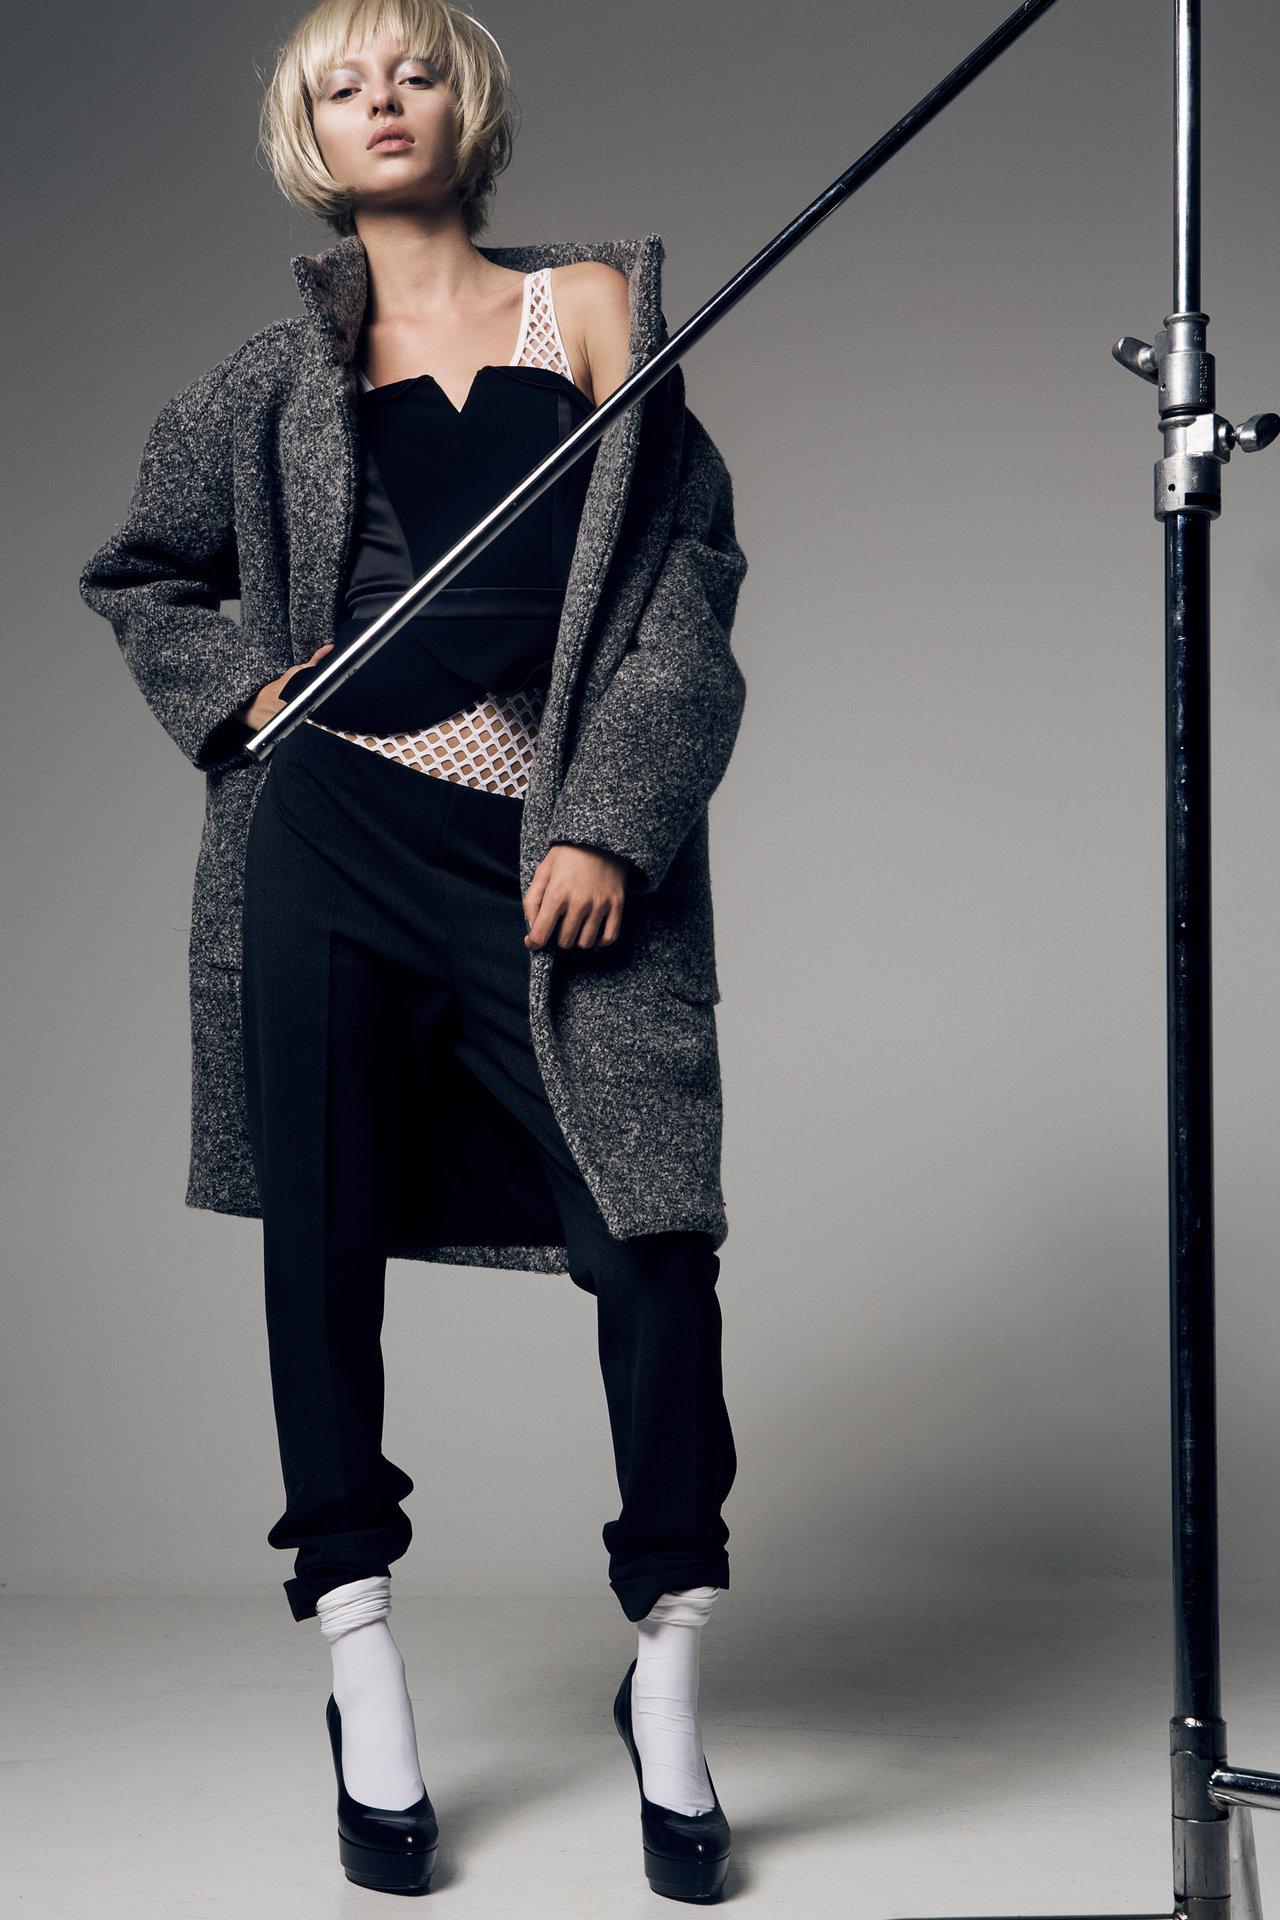 Hair, Makeup & Manicure: Melanie Volkart Photographer: Ellin Anderegg Stylist: Elif Gedik Model: Luisa Laemmel